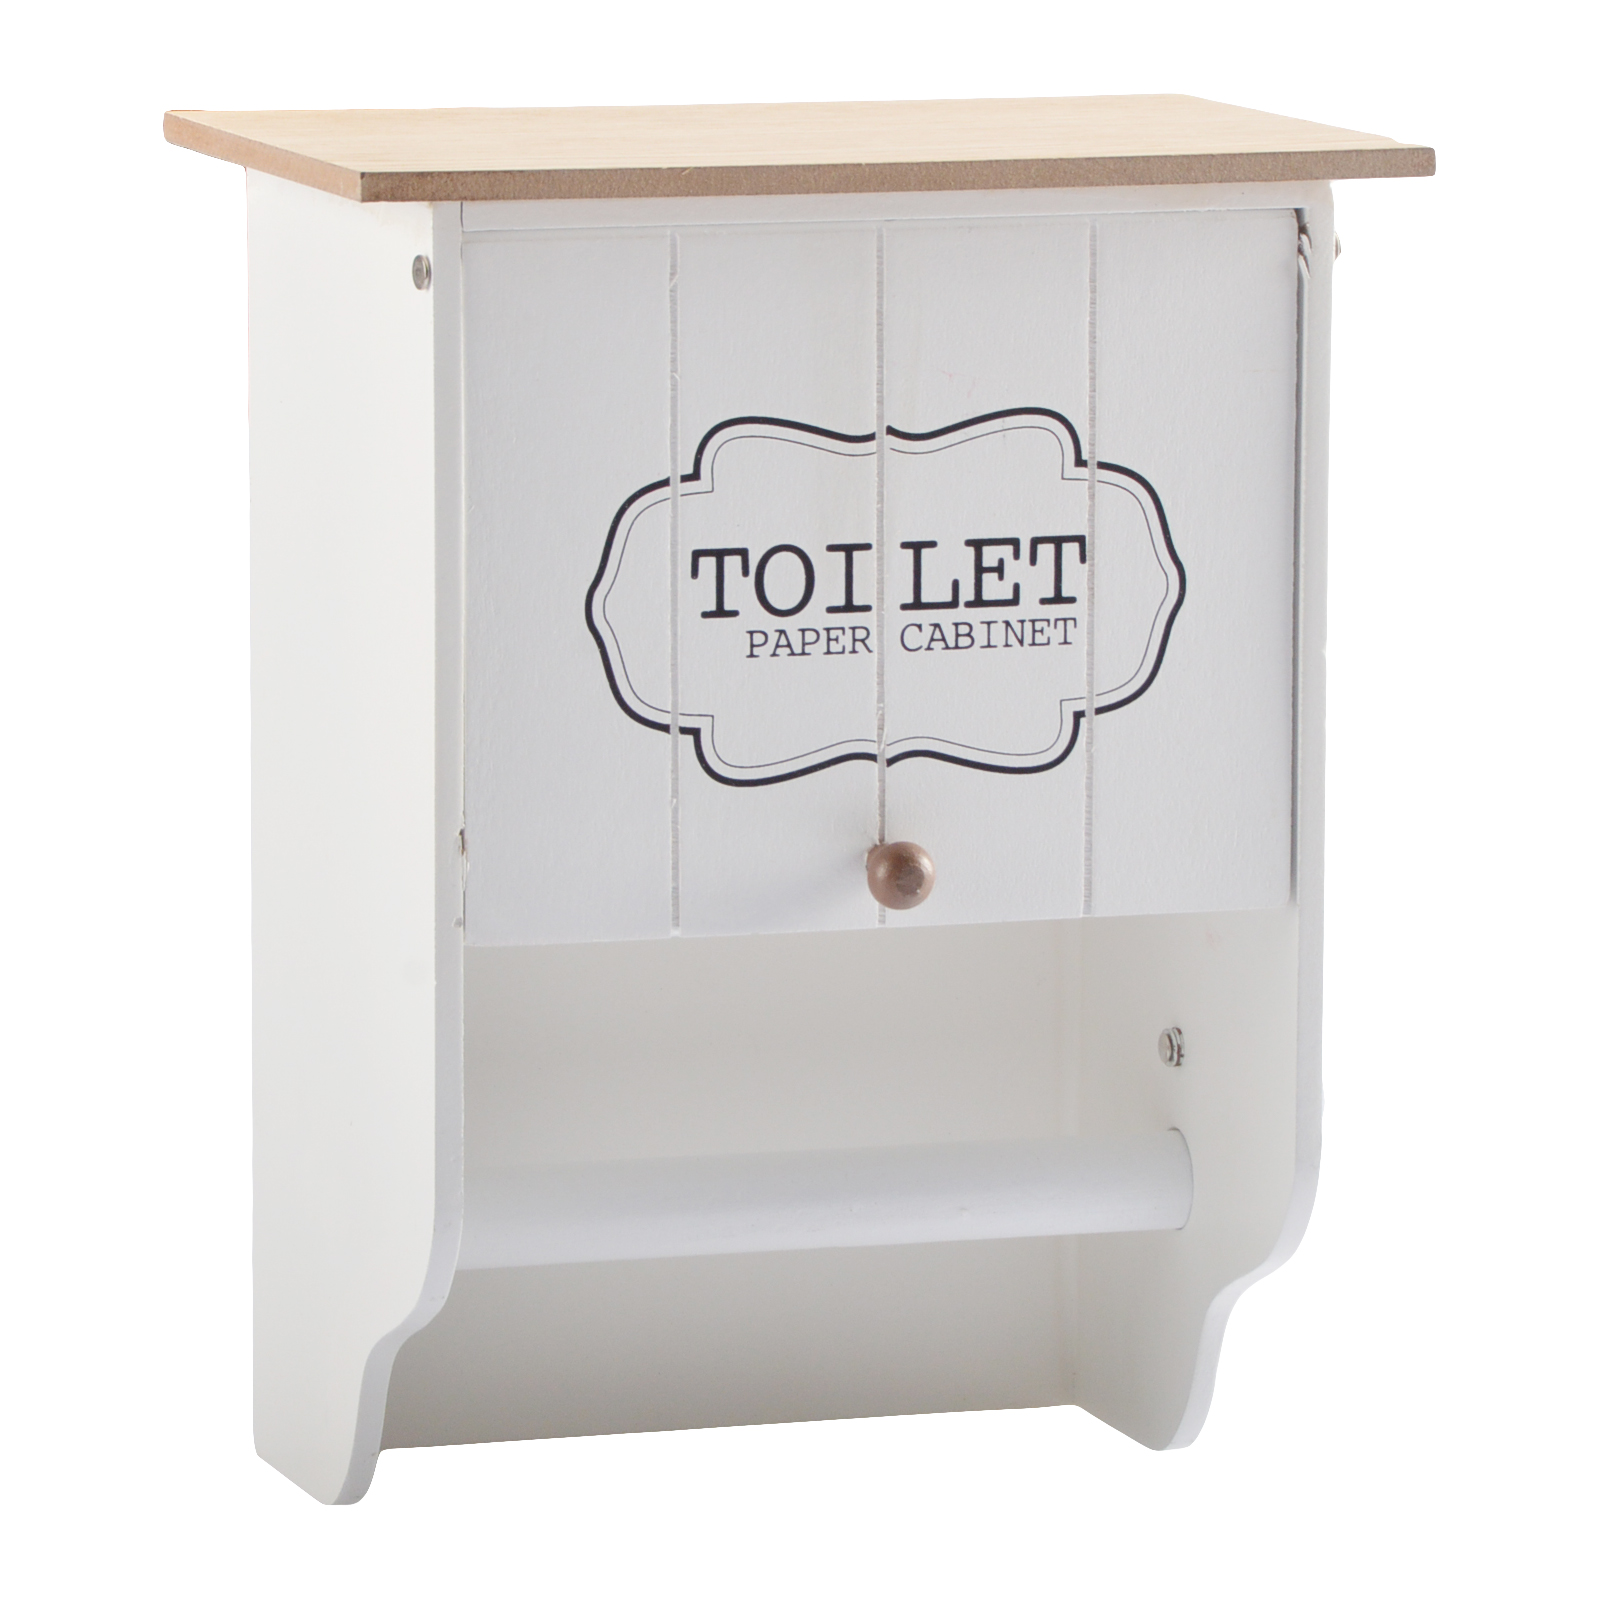 toilettenpapierhalter klopapierhalter rollenhalter holz cabinet shabby chic. Black Bedroom Furniture Sets. Home Design Ideas